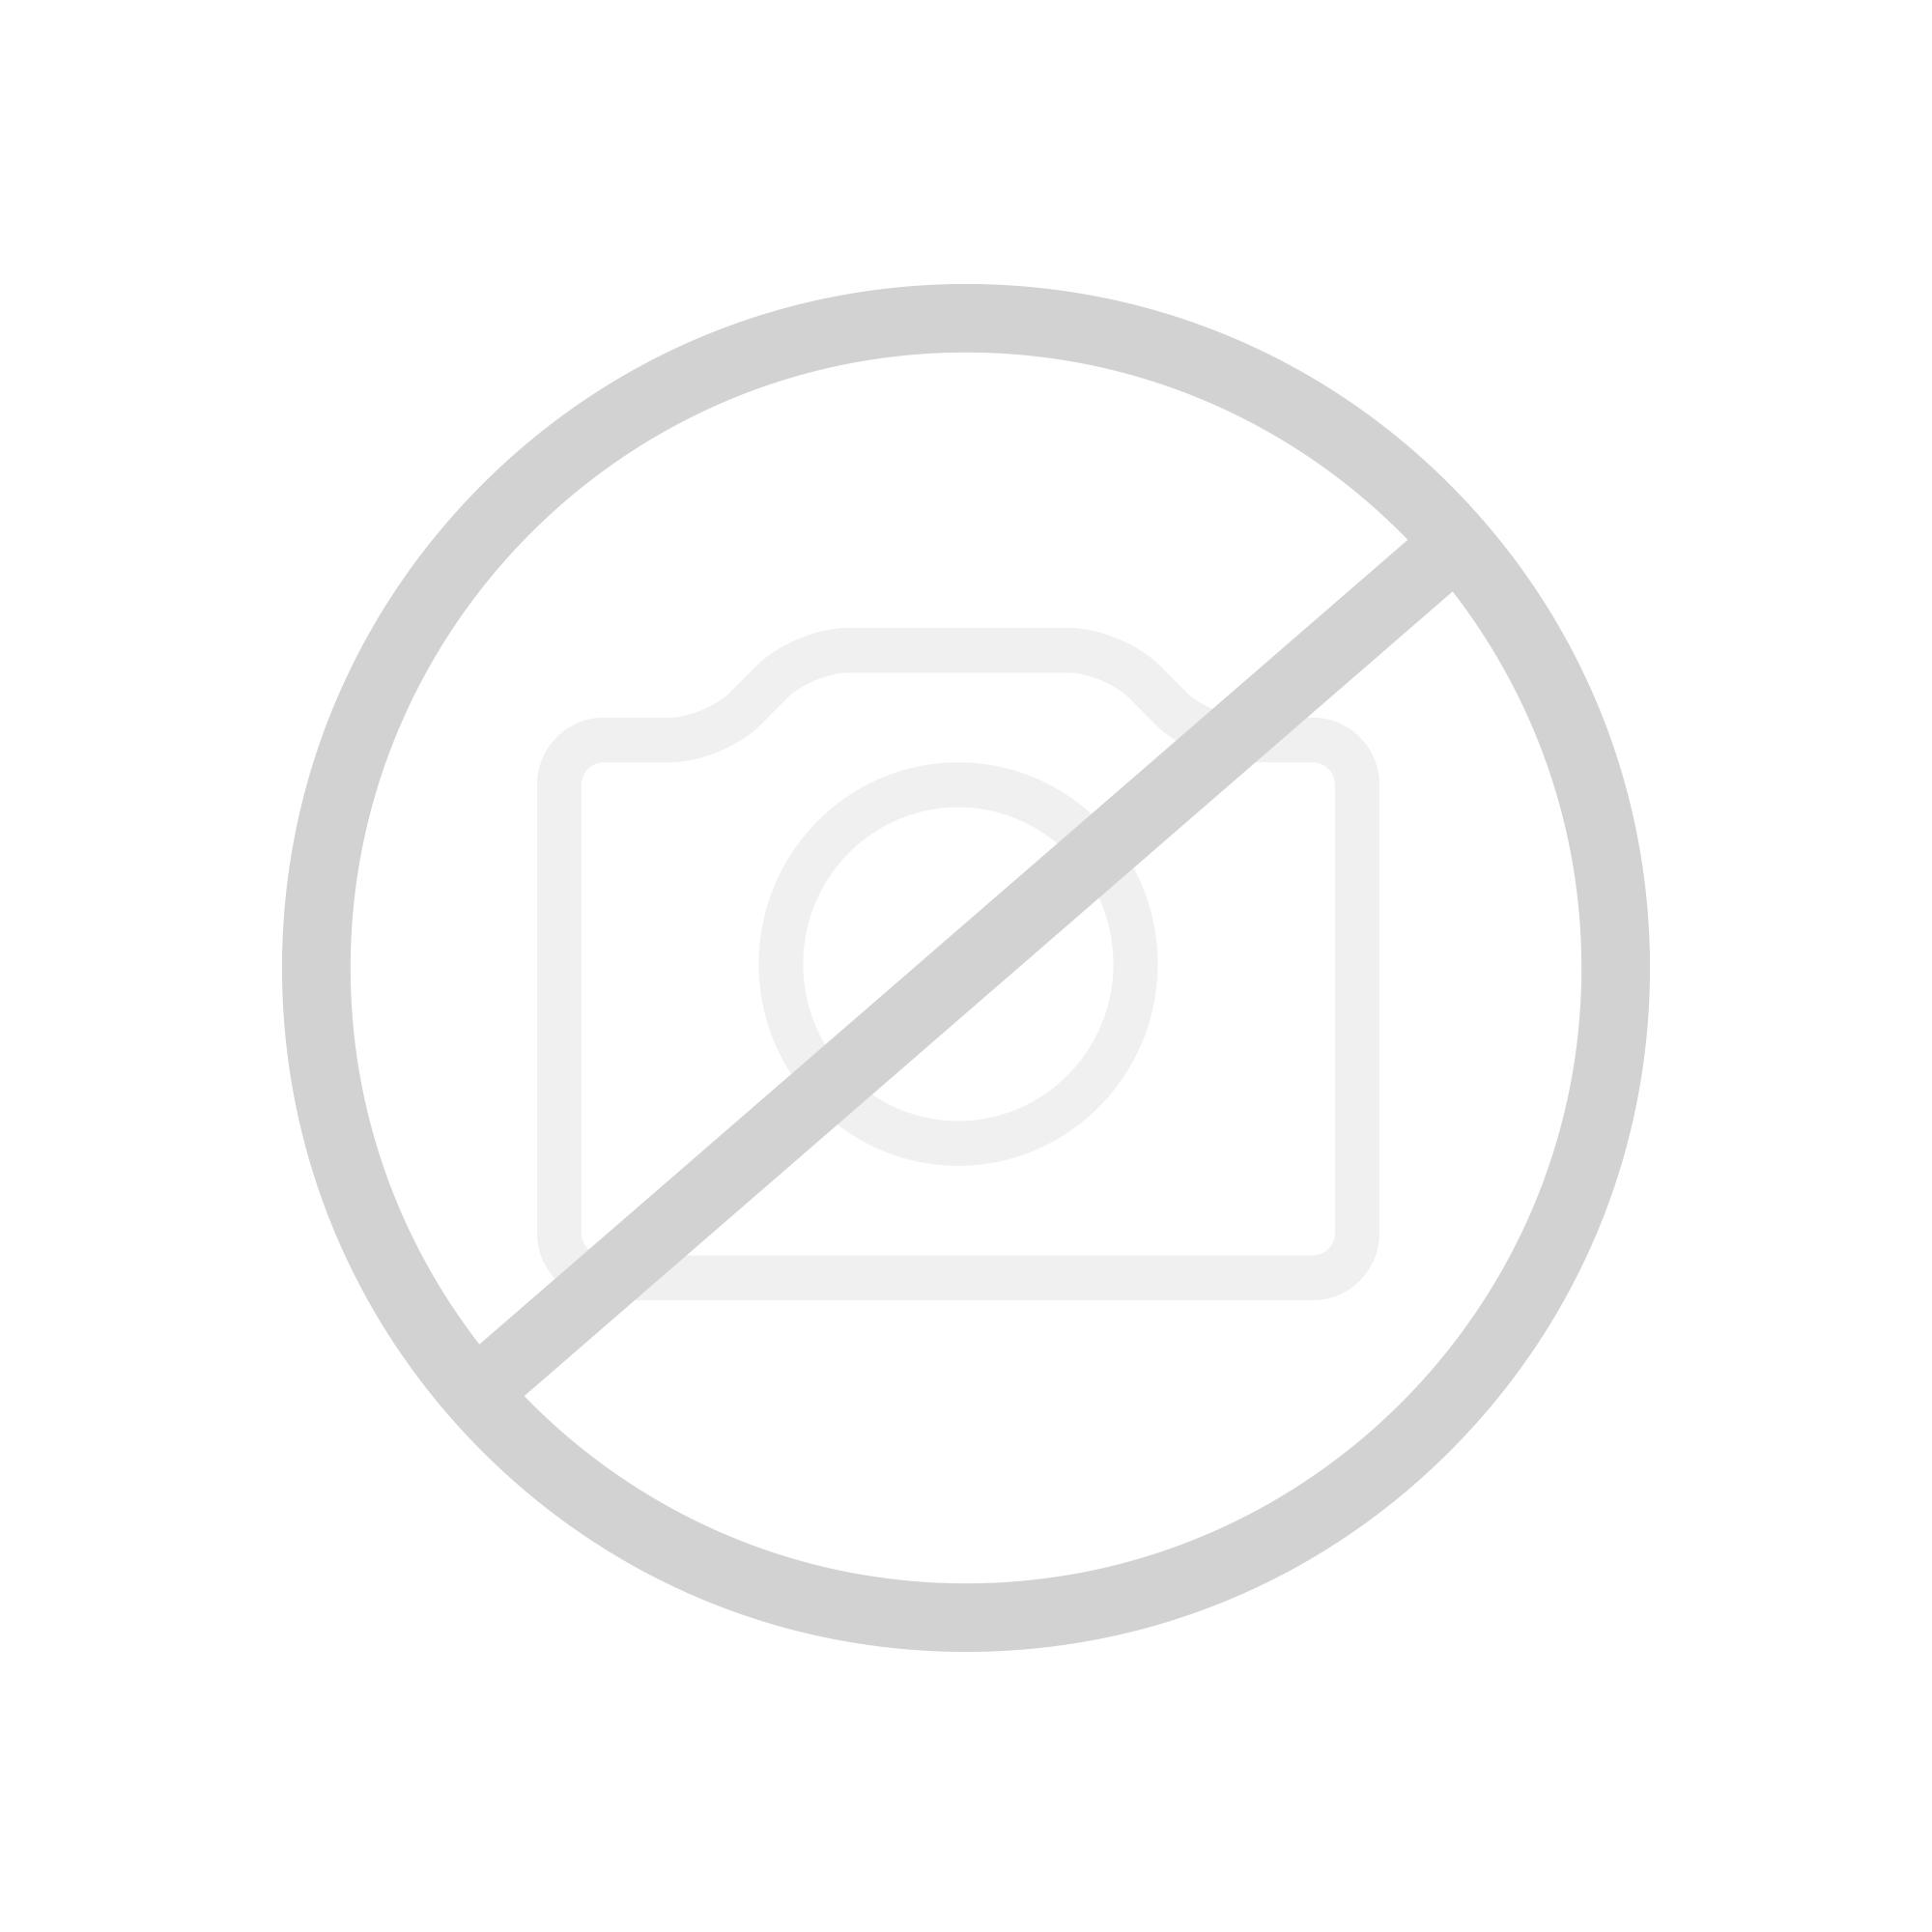 keramag icon wand bidet l 54 b 35 5 cm wei 234000000 reuter onlineshop. Black Bedroom Furniture Sets. Home Design Ideas